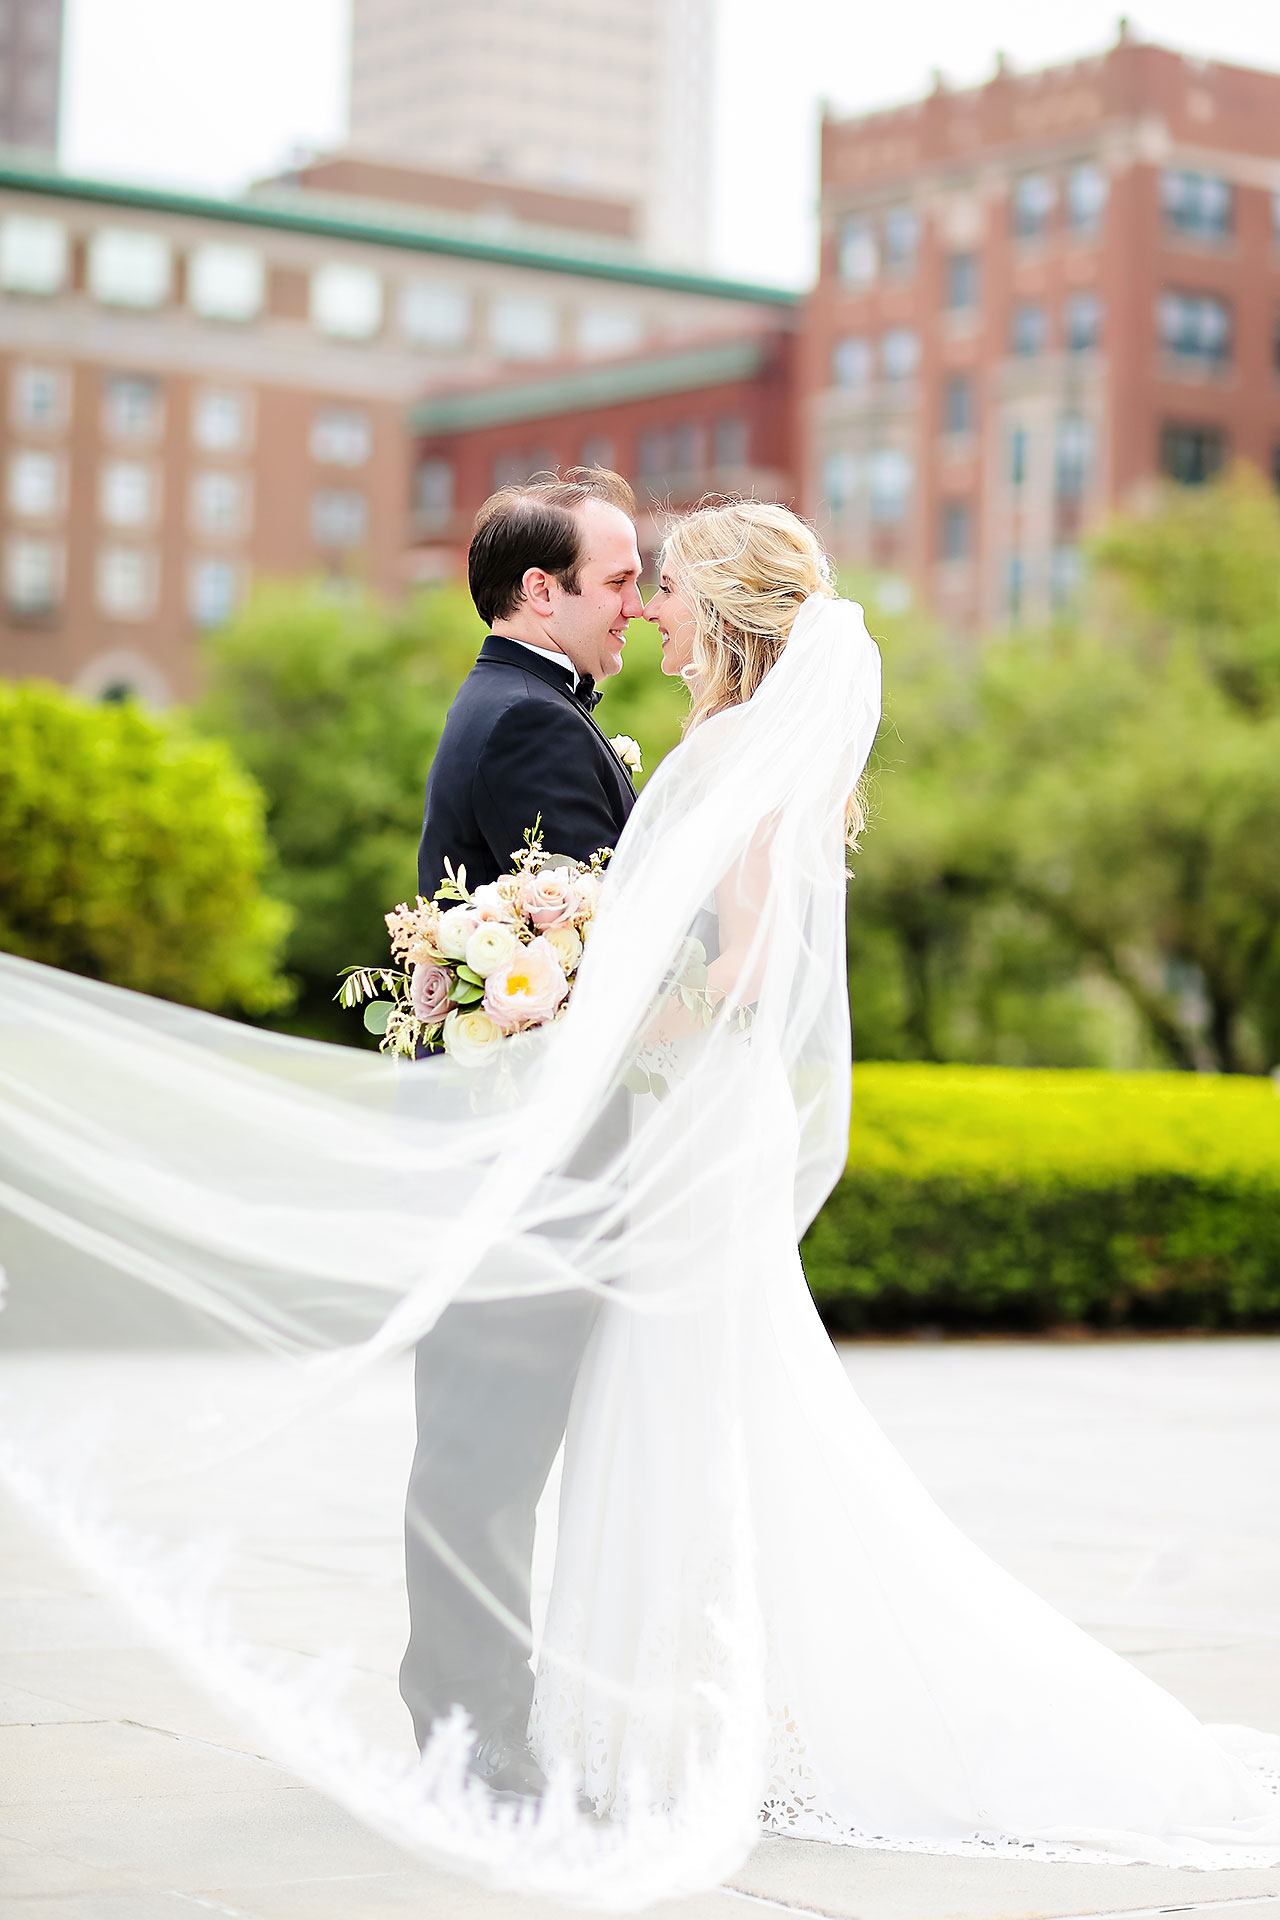 Allison Jeff Union Station Crowne Plaza Indianapolis wedding 202